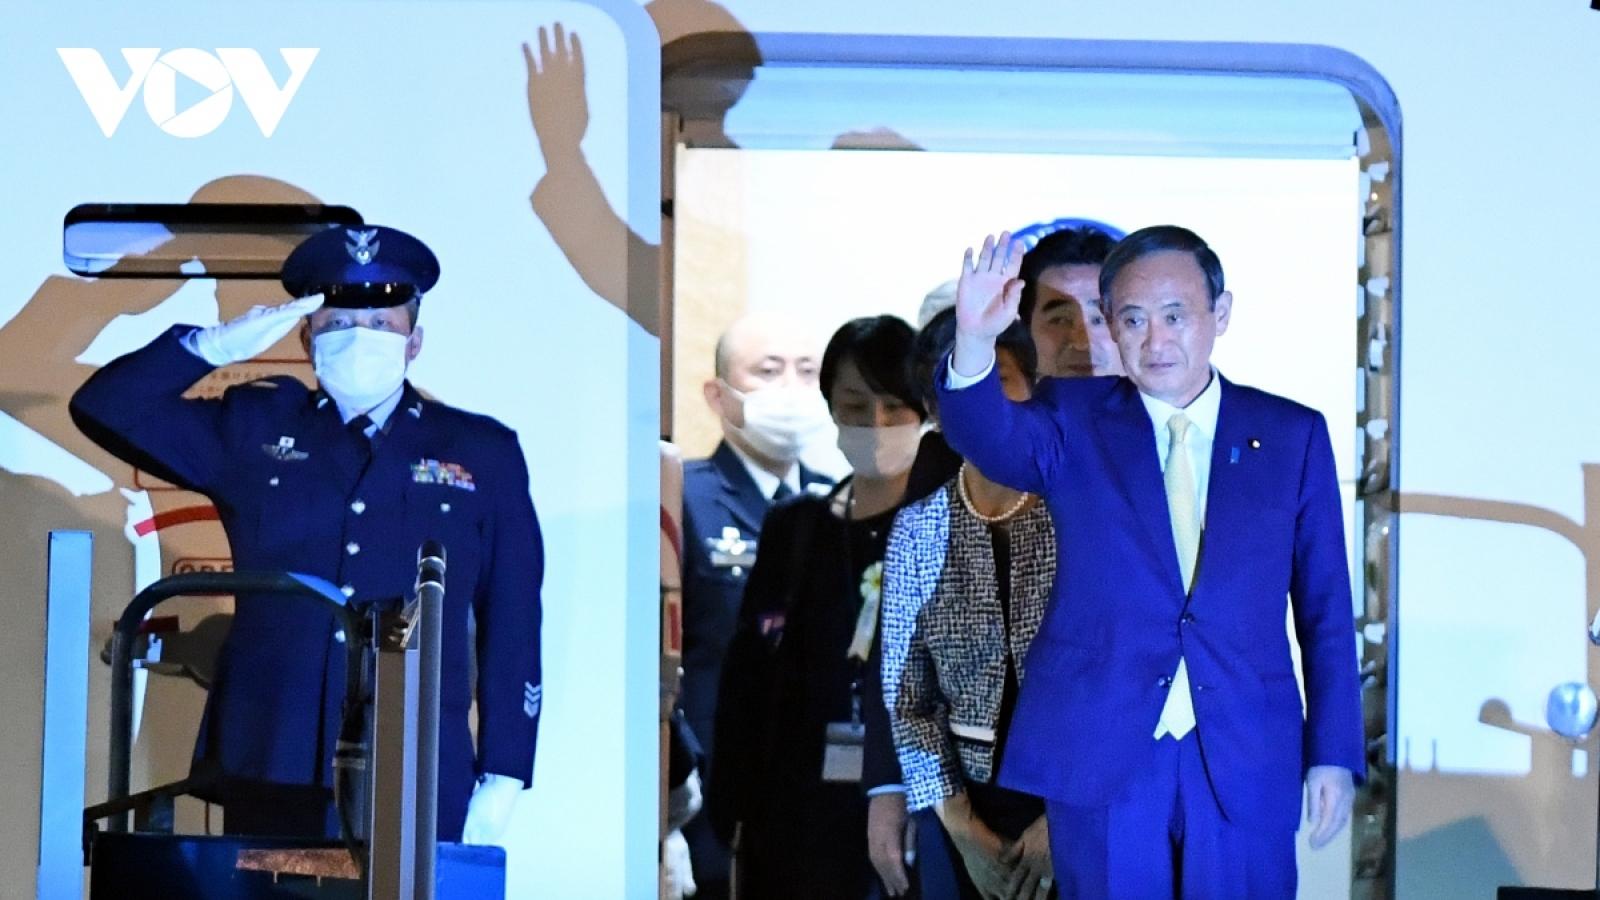 Japanese Prime Minister Suga Yoshihide arrives in Hanoi for official visit